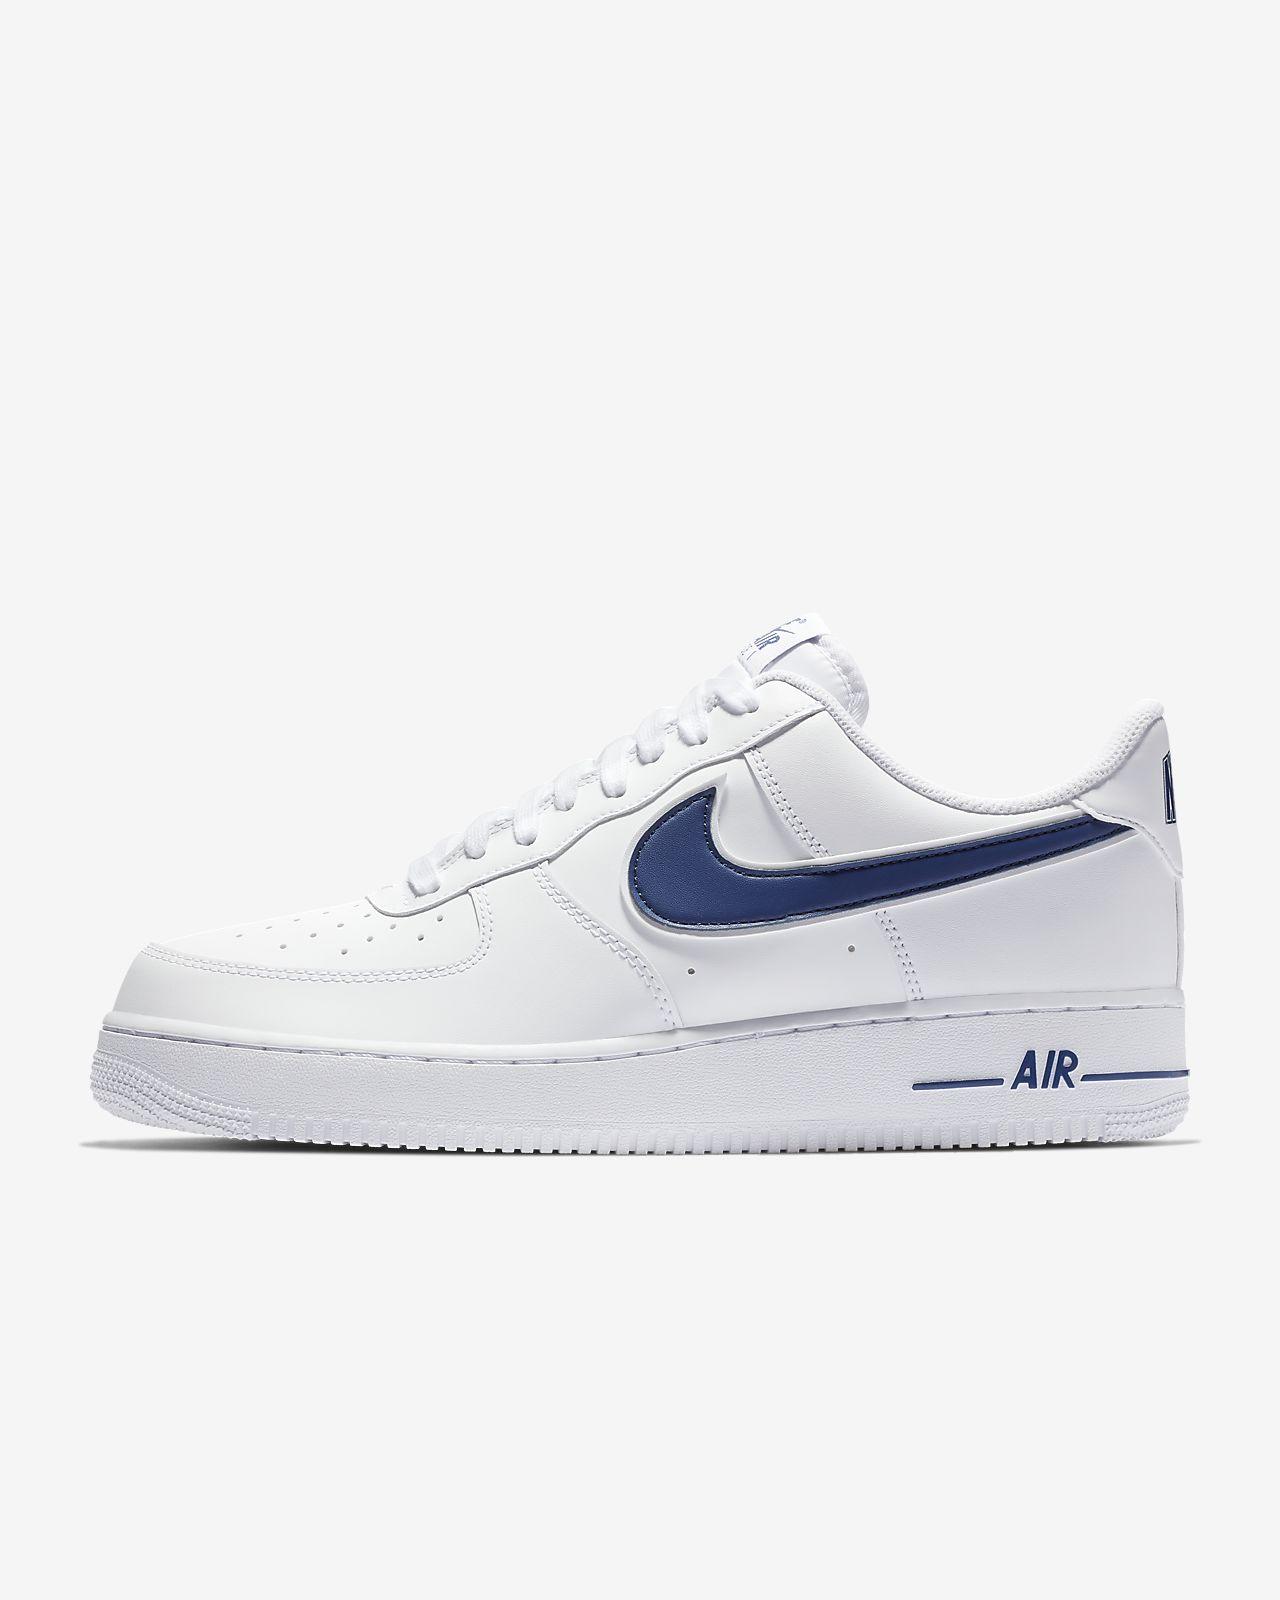 quality design b00b6 2305b ... Chaussure Nike Air Force 1  07 pour Homme